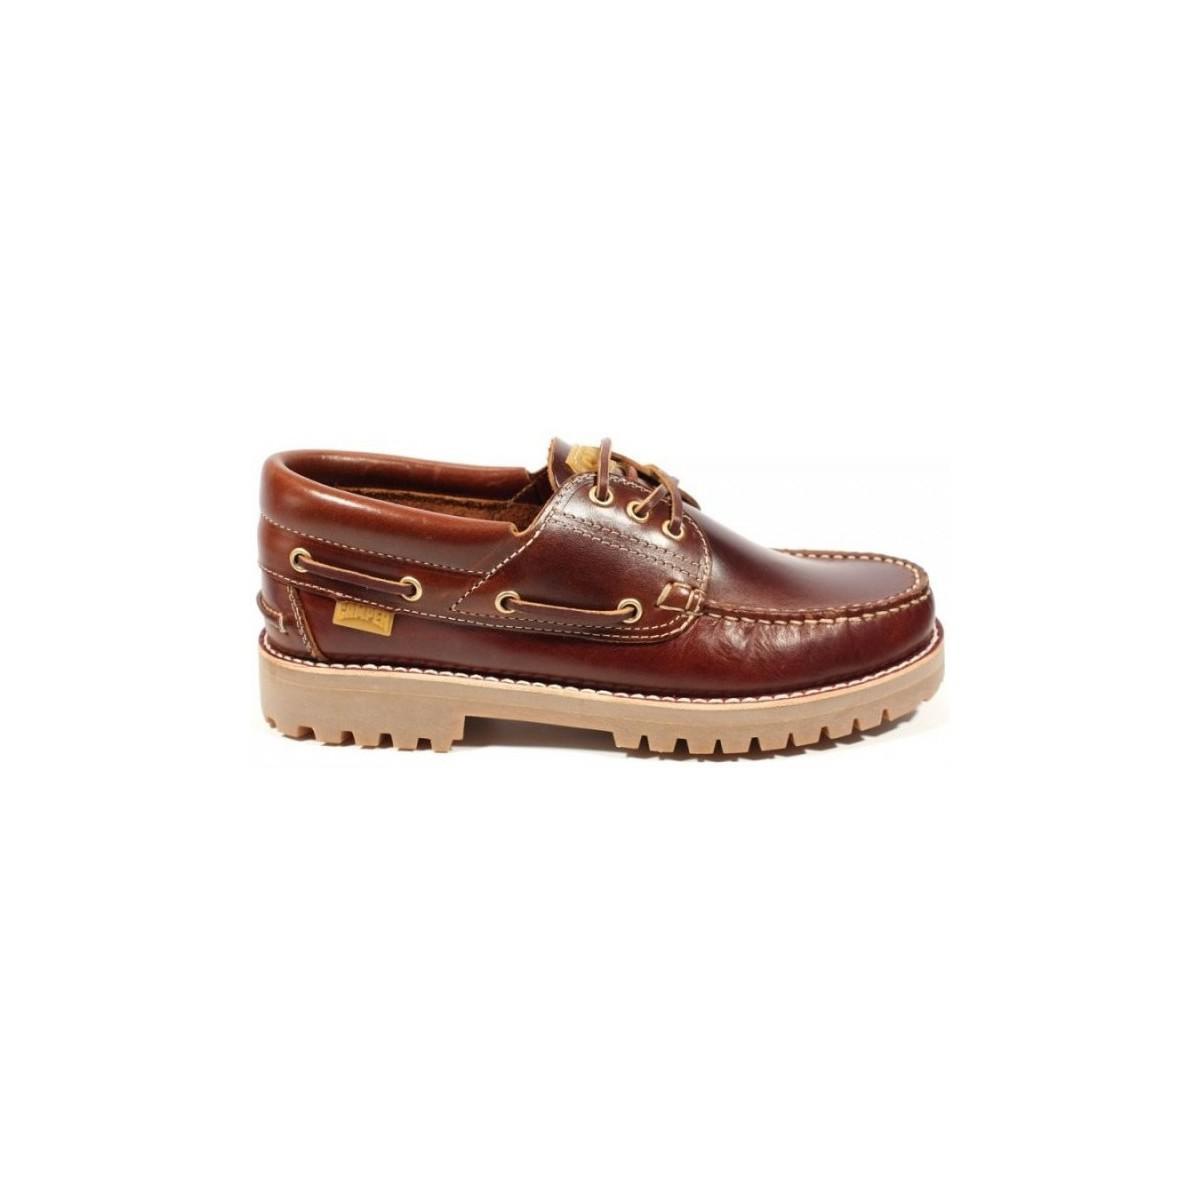 Camper Nautico 15233 - 001 Men's Boat Shoes In Brown for Men